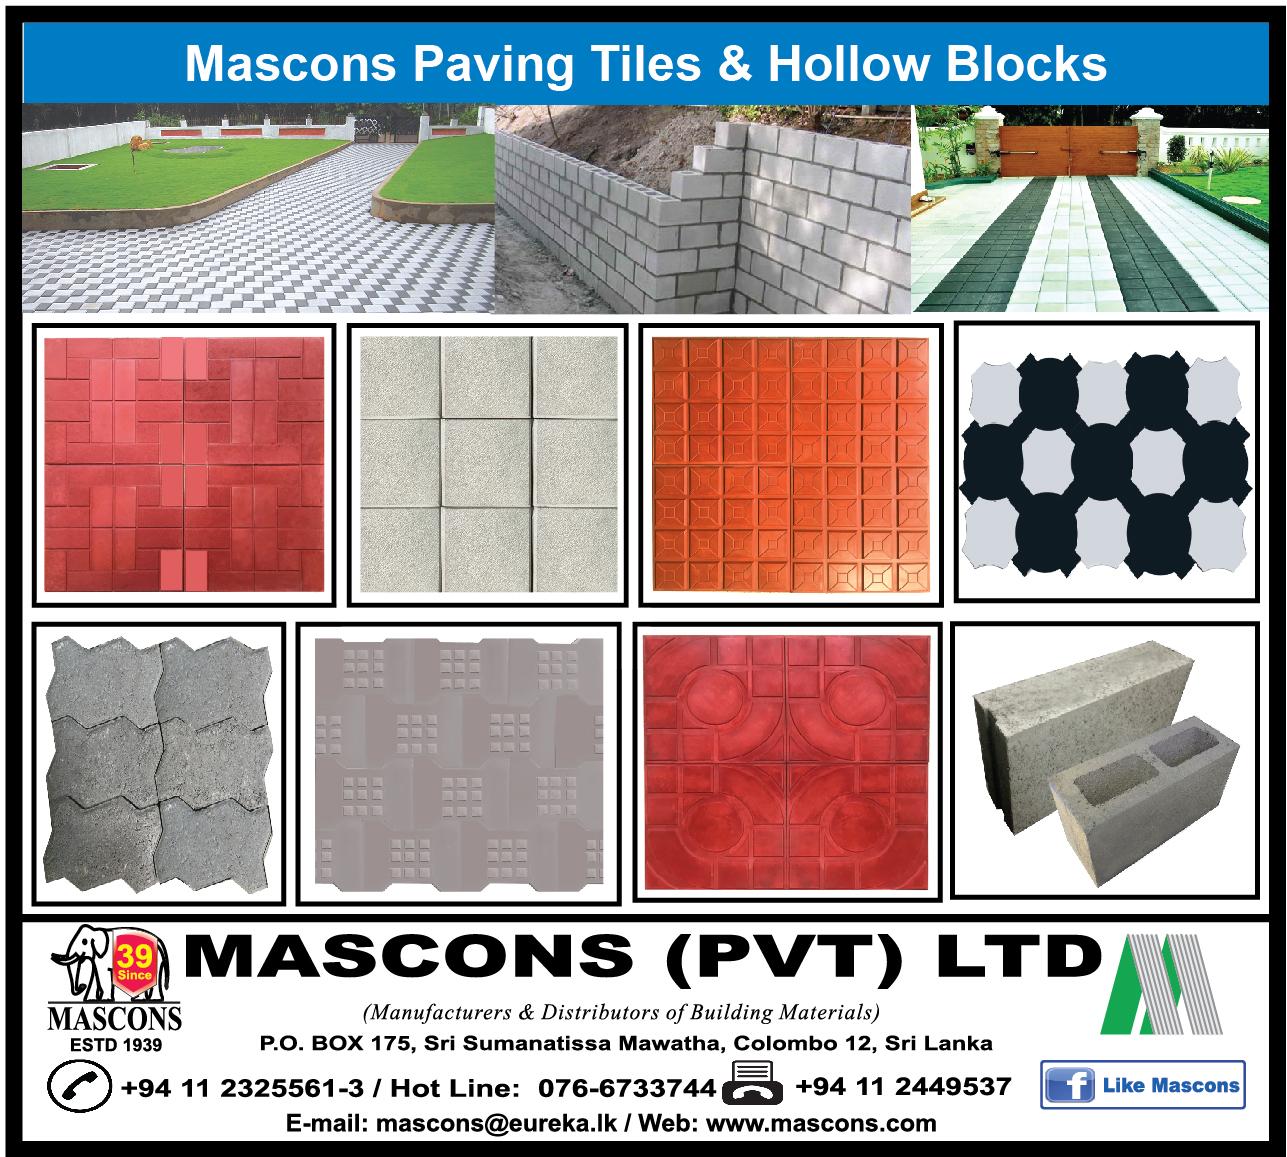 Floor - Materials & Laying - Mascons (Pvt) Ltd